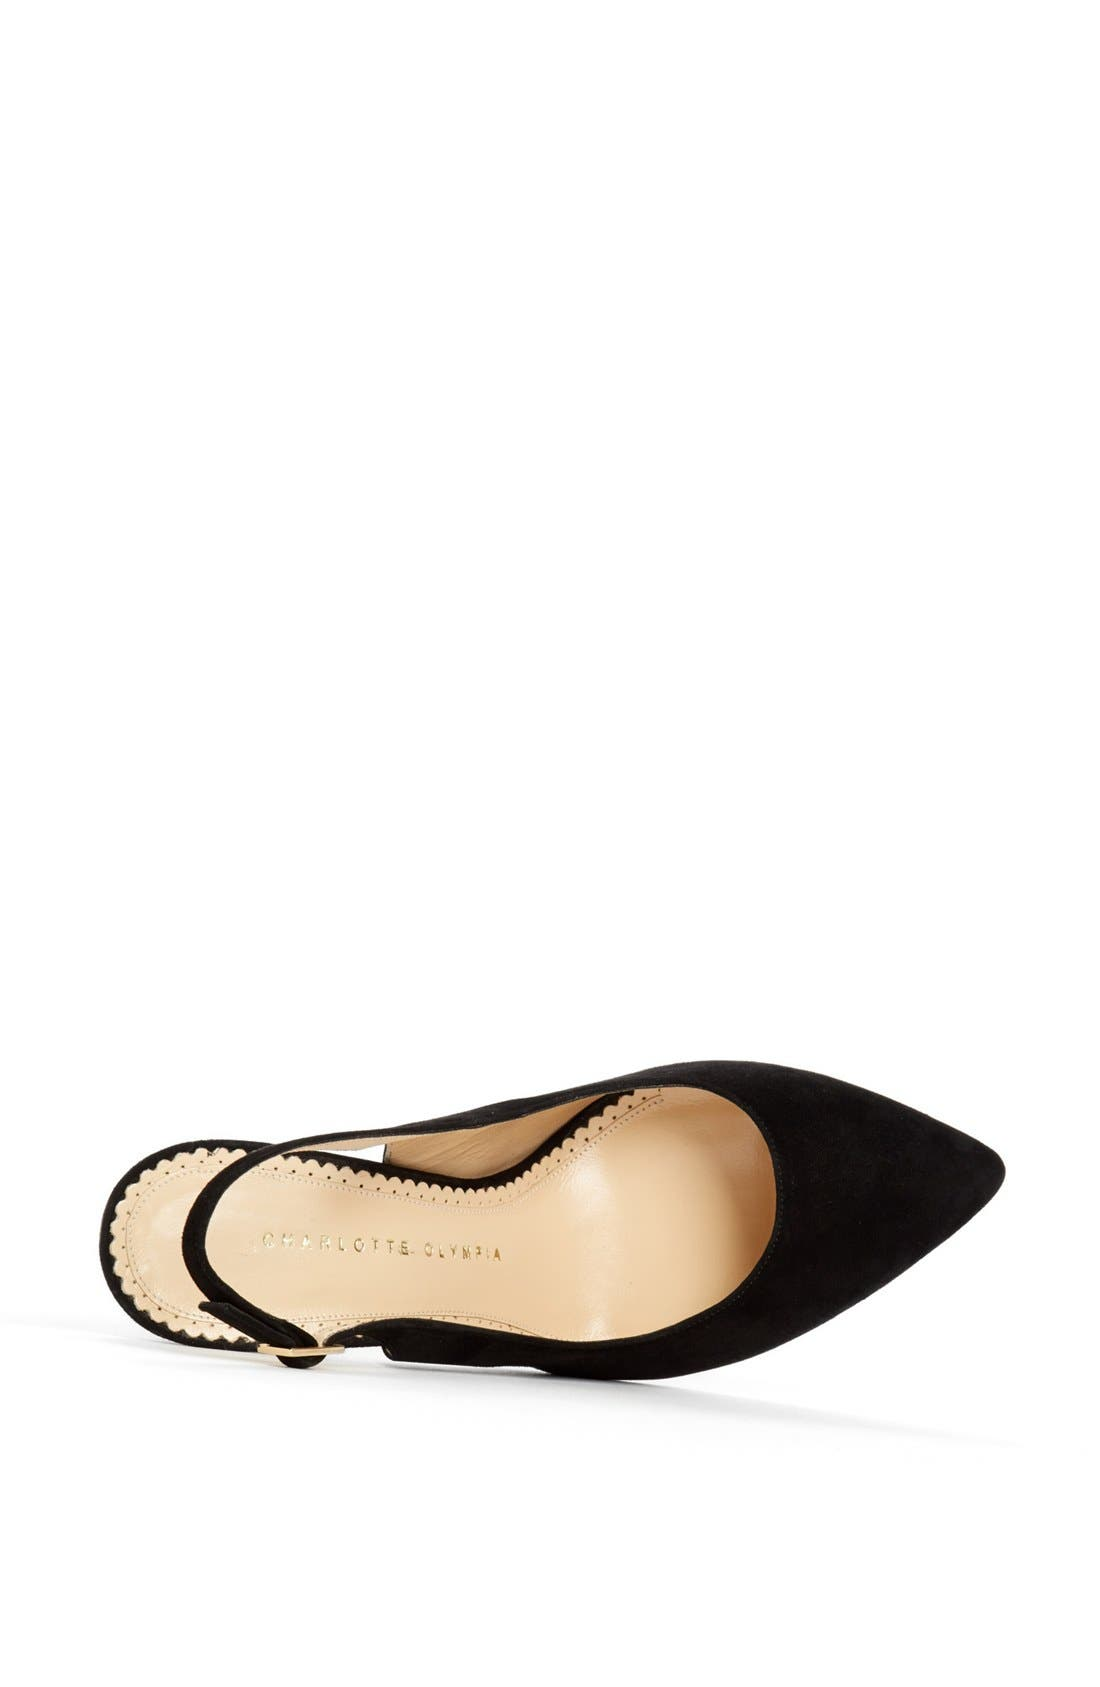 Alternate Image 3  - Charlotte Olympia 'Monroe' Slingback Pointy Toe Pump